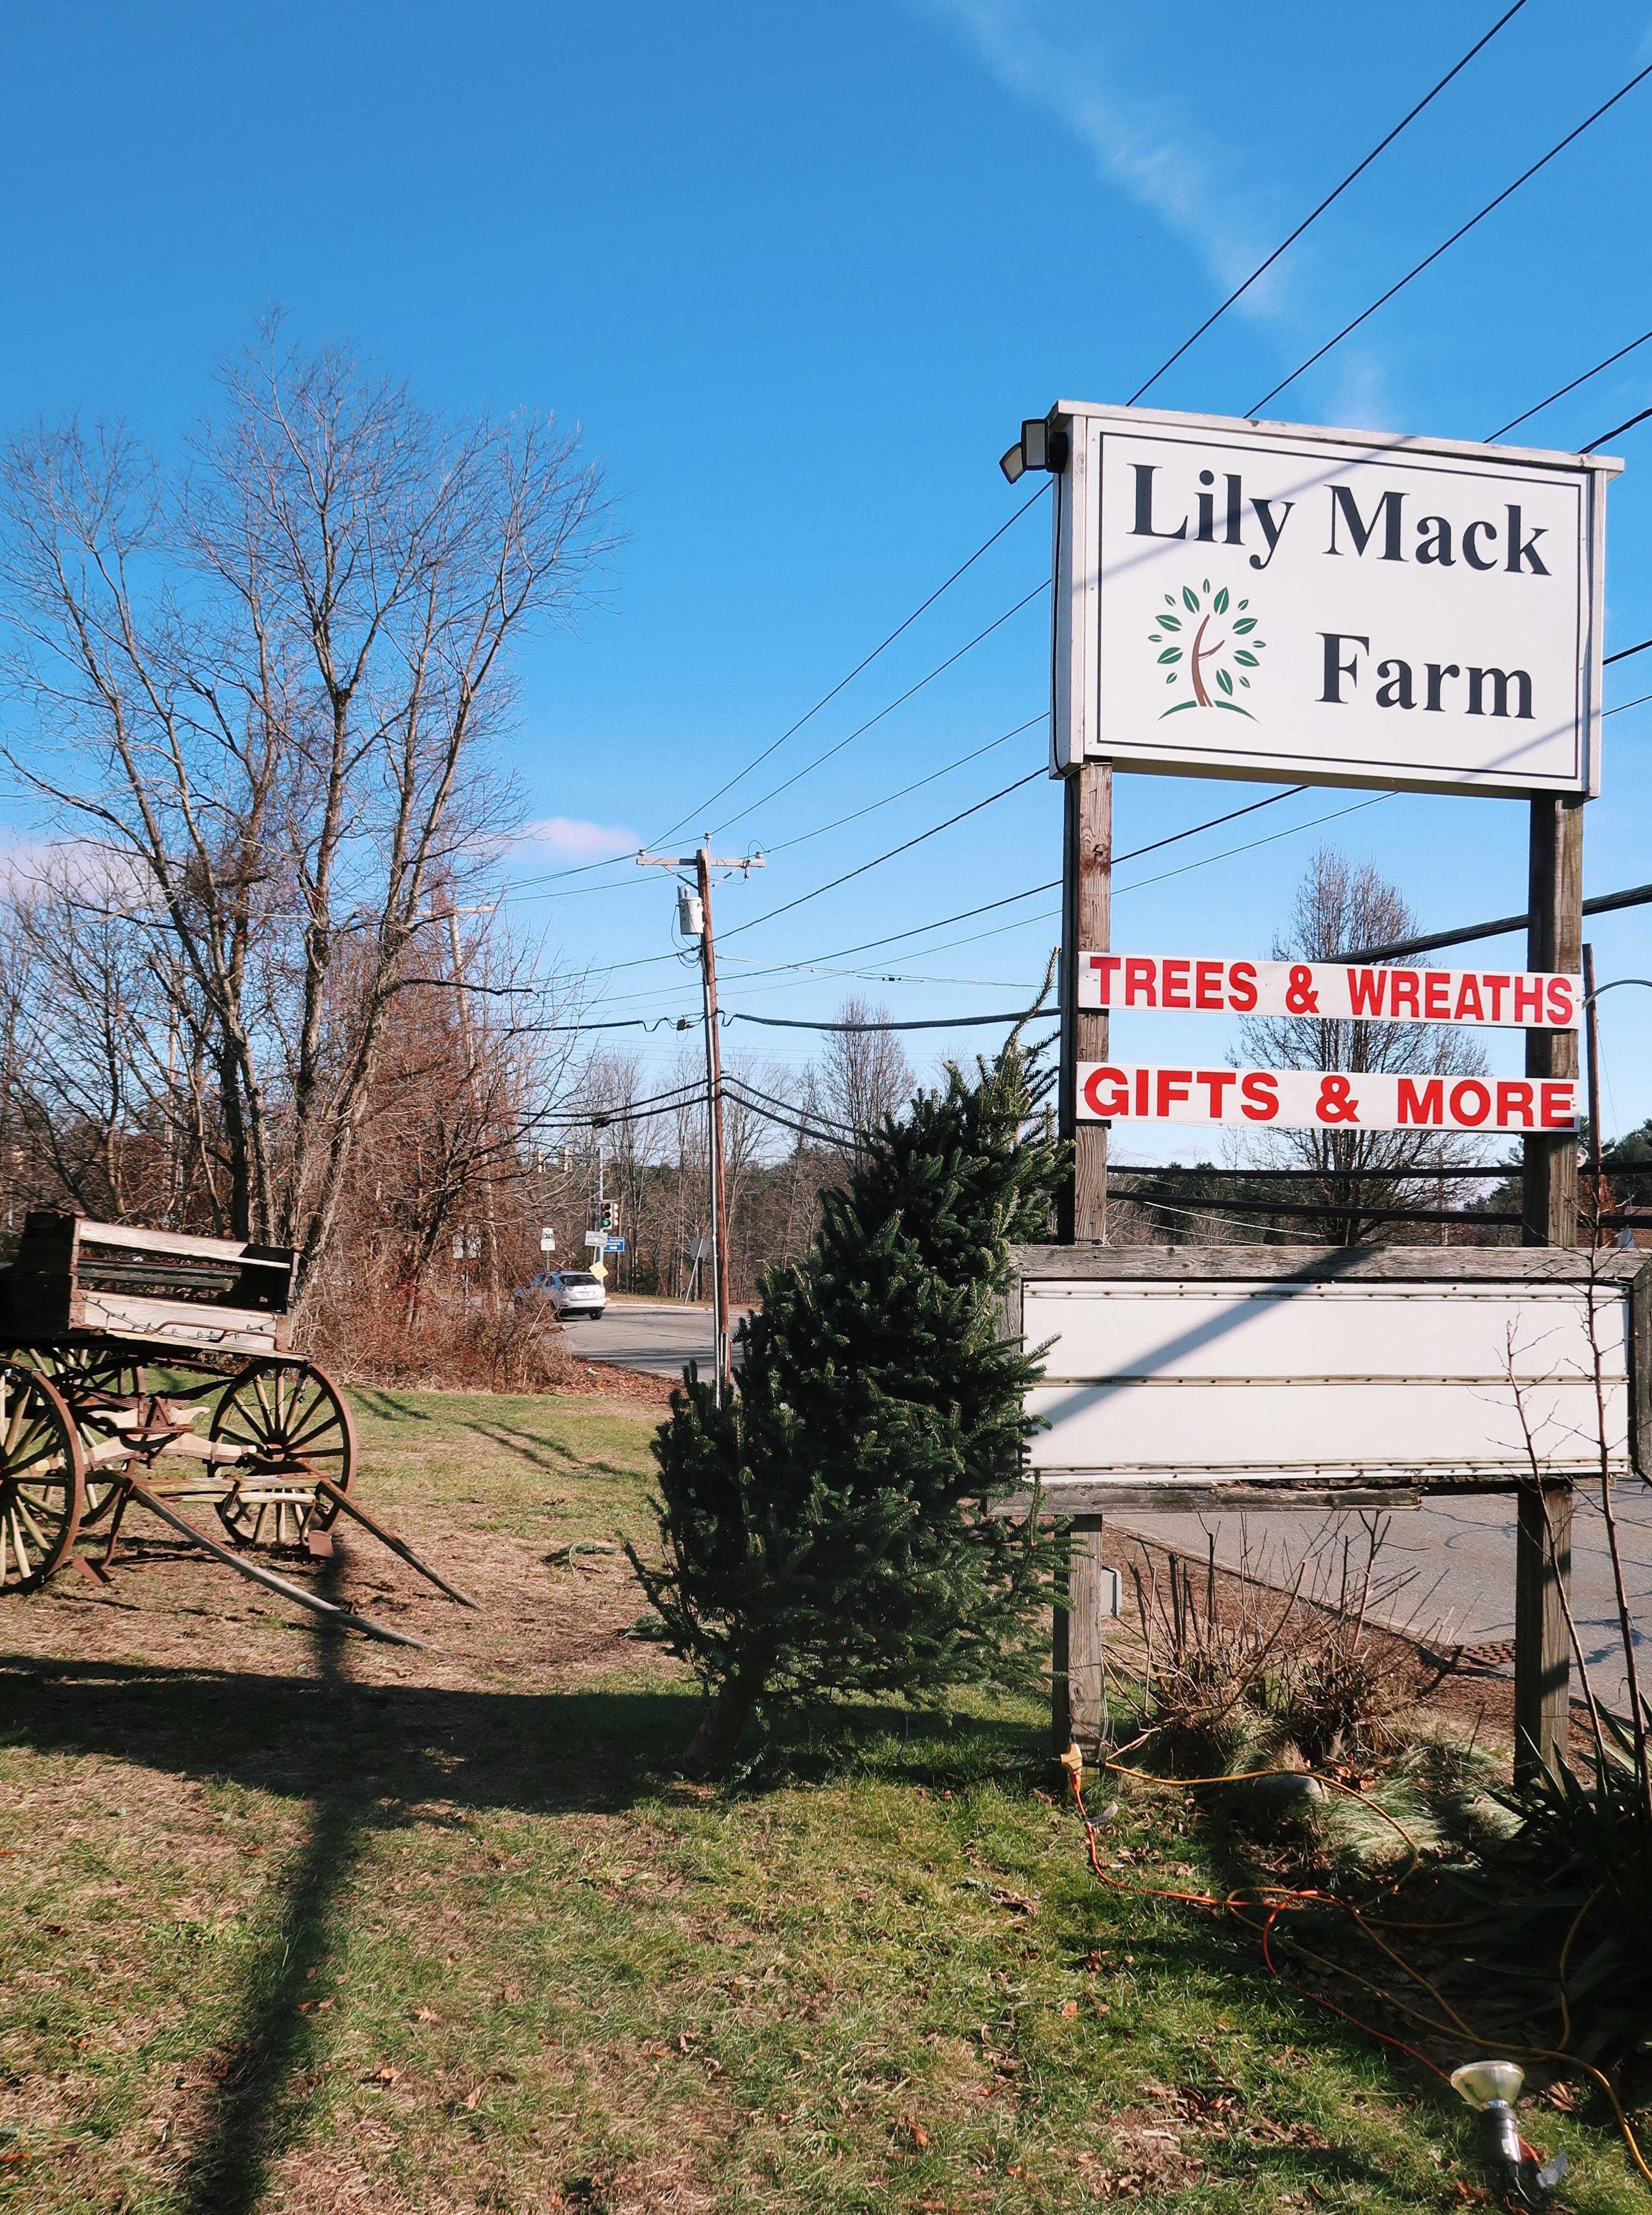 lily mack farm dracut